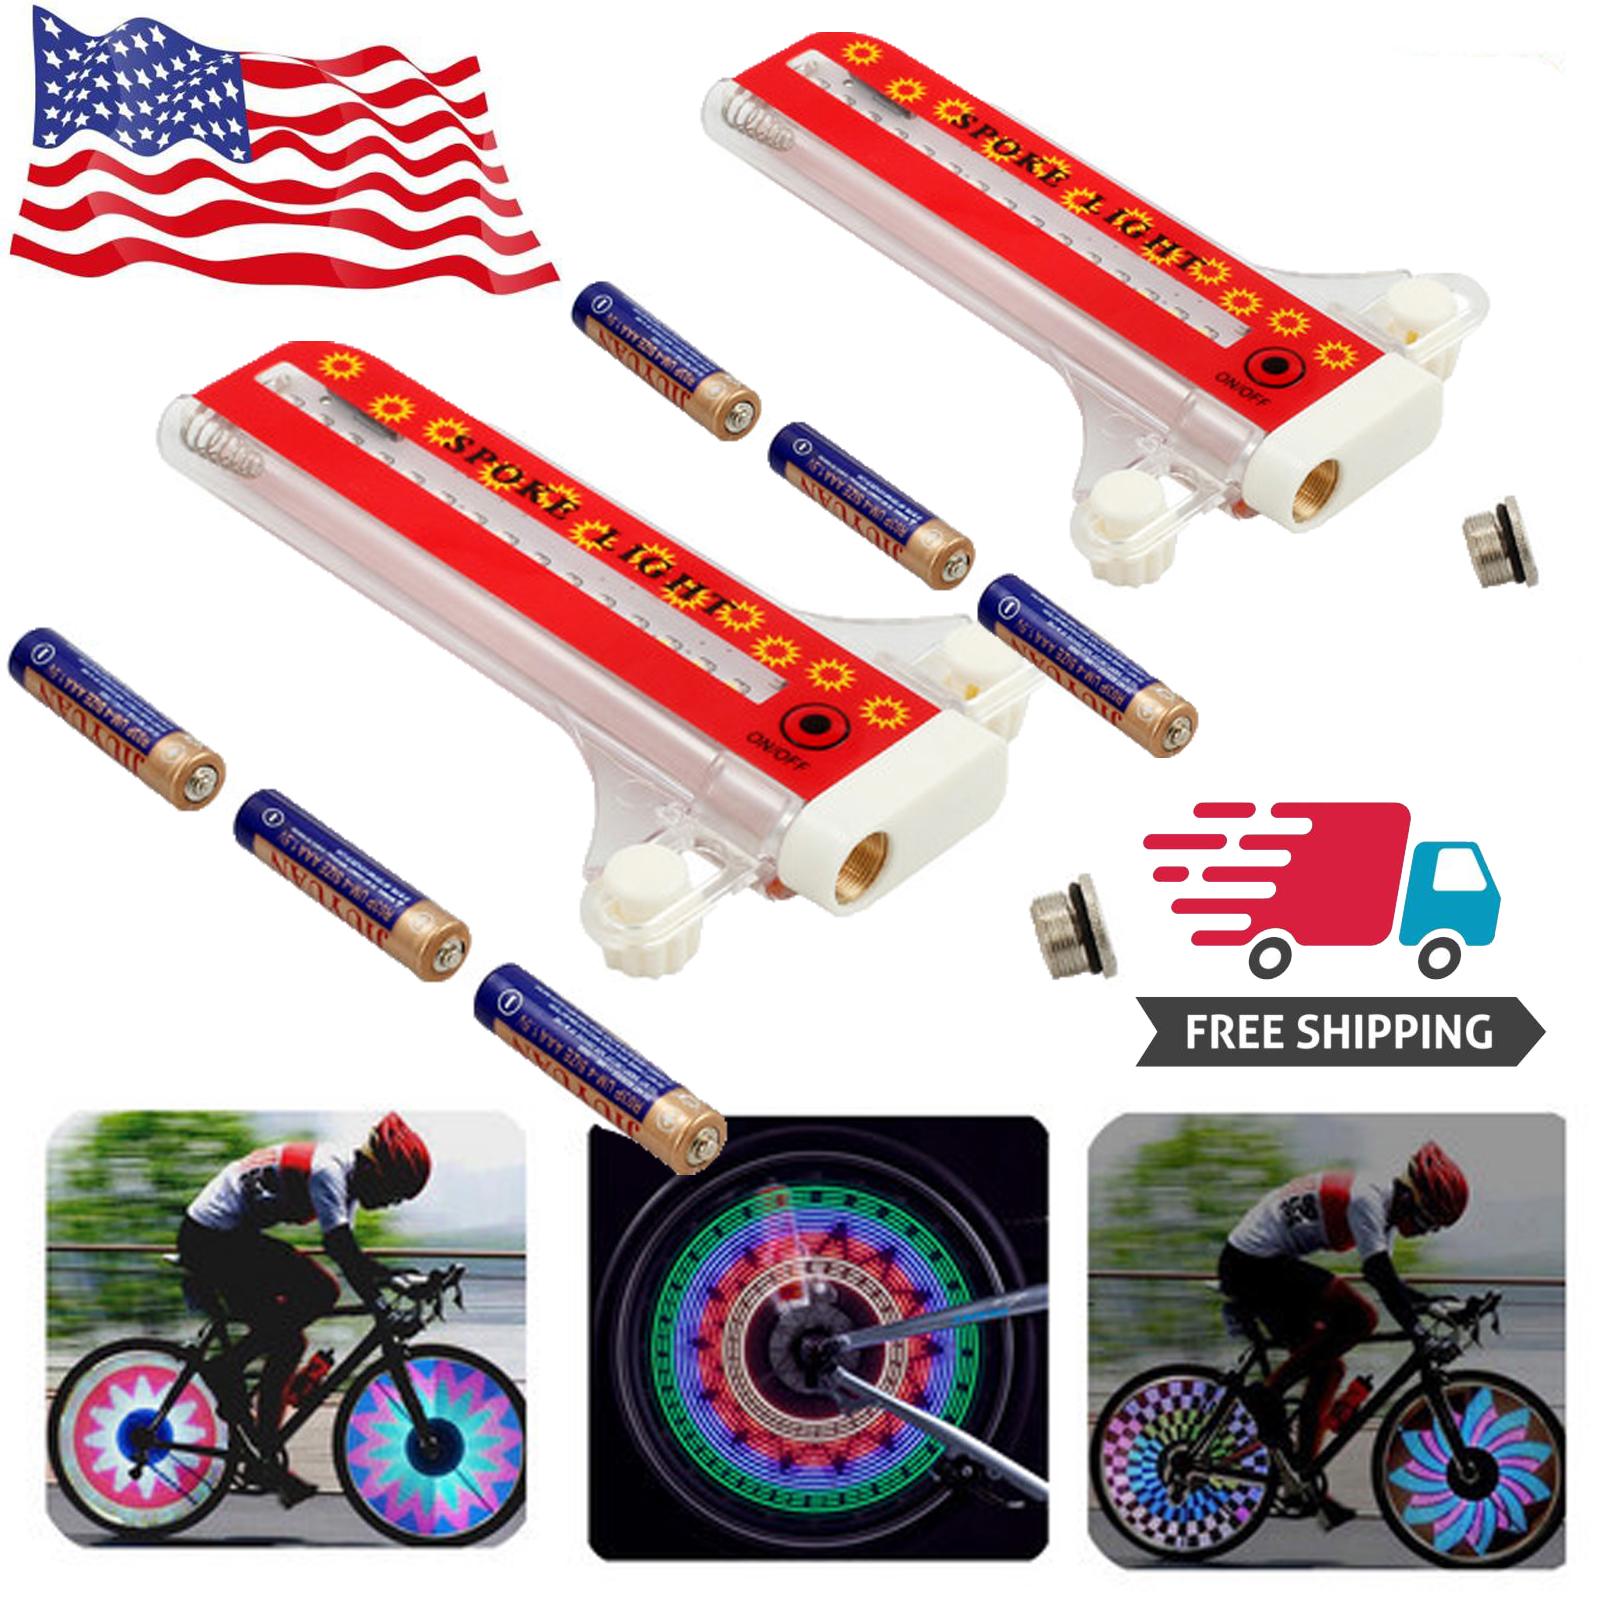 32 LED Colorful Light Rainbow Bicycle Bike Wheel Spoke Flashing Side Tire